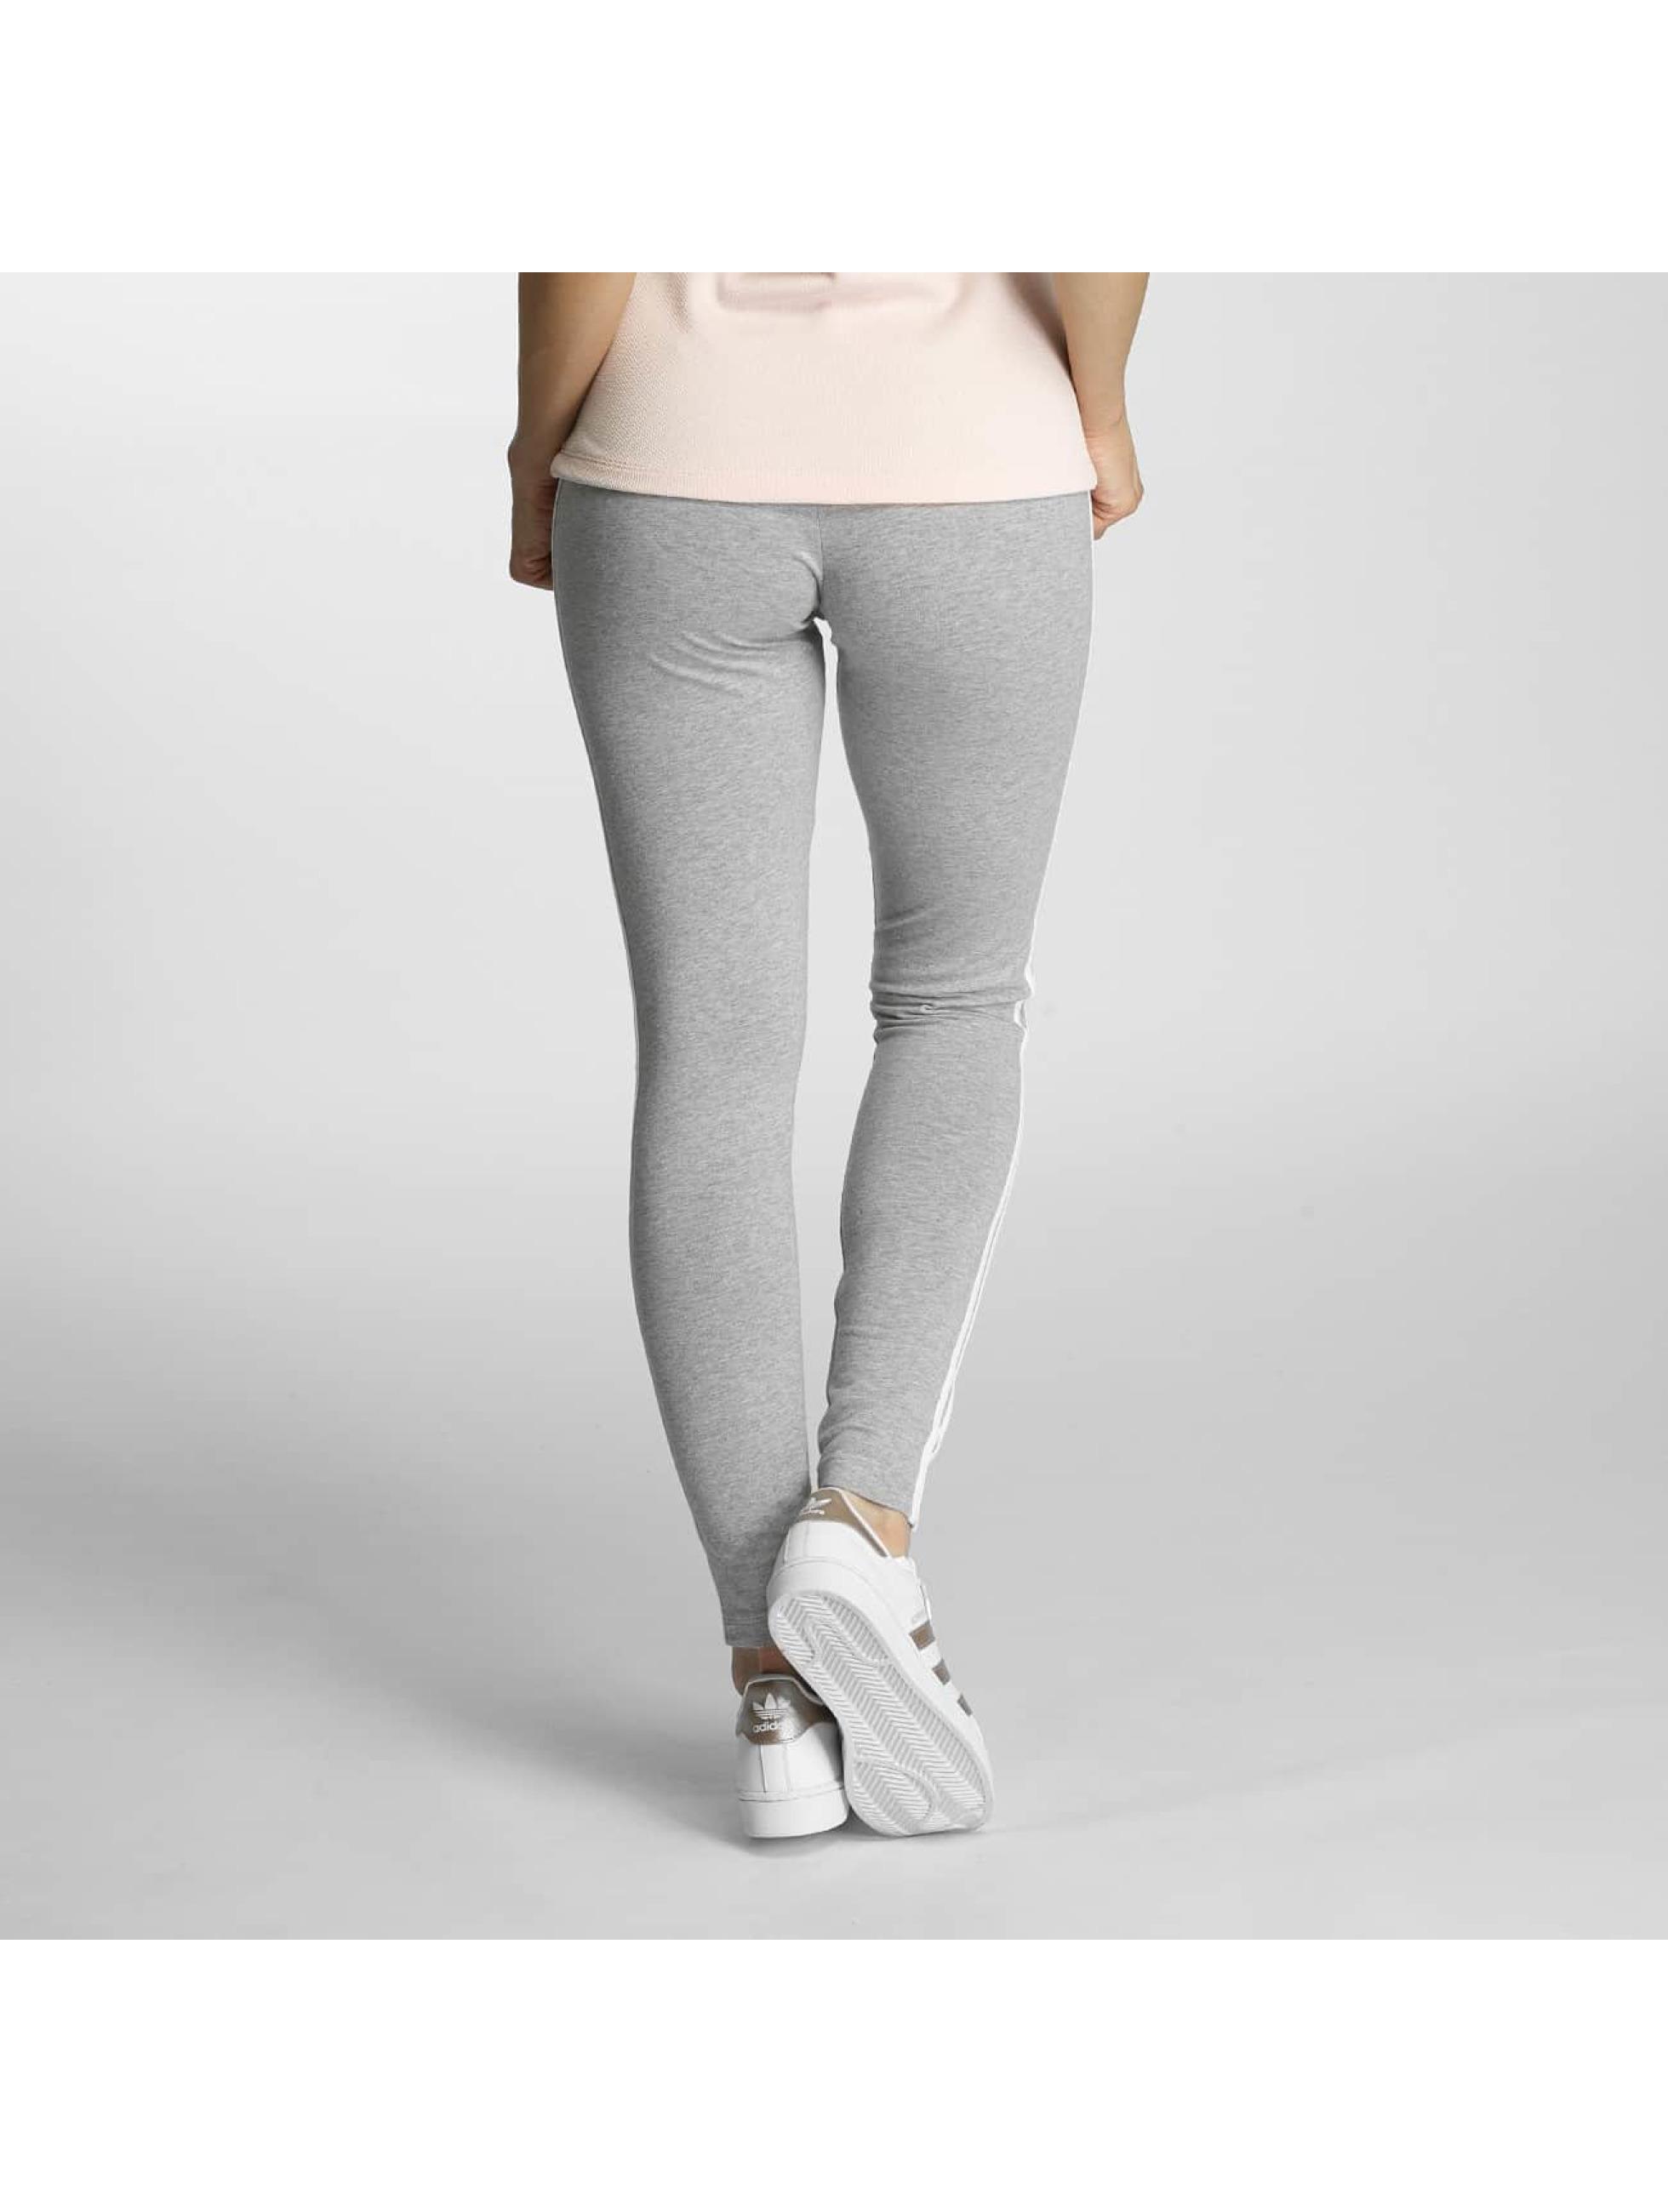 adidas Leggings/Treggings 3 Stripes gray